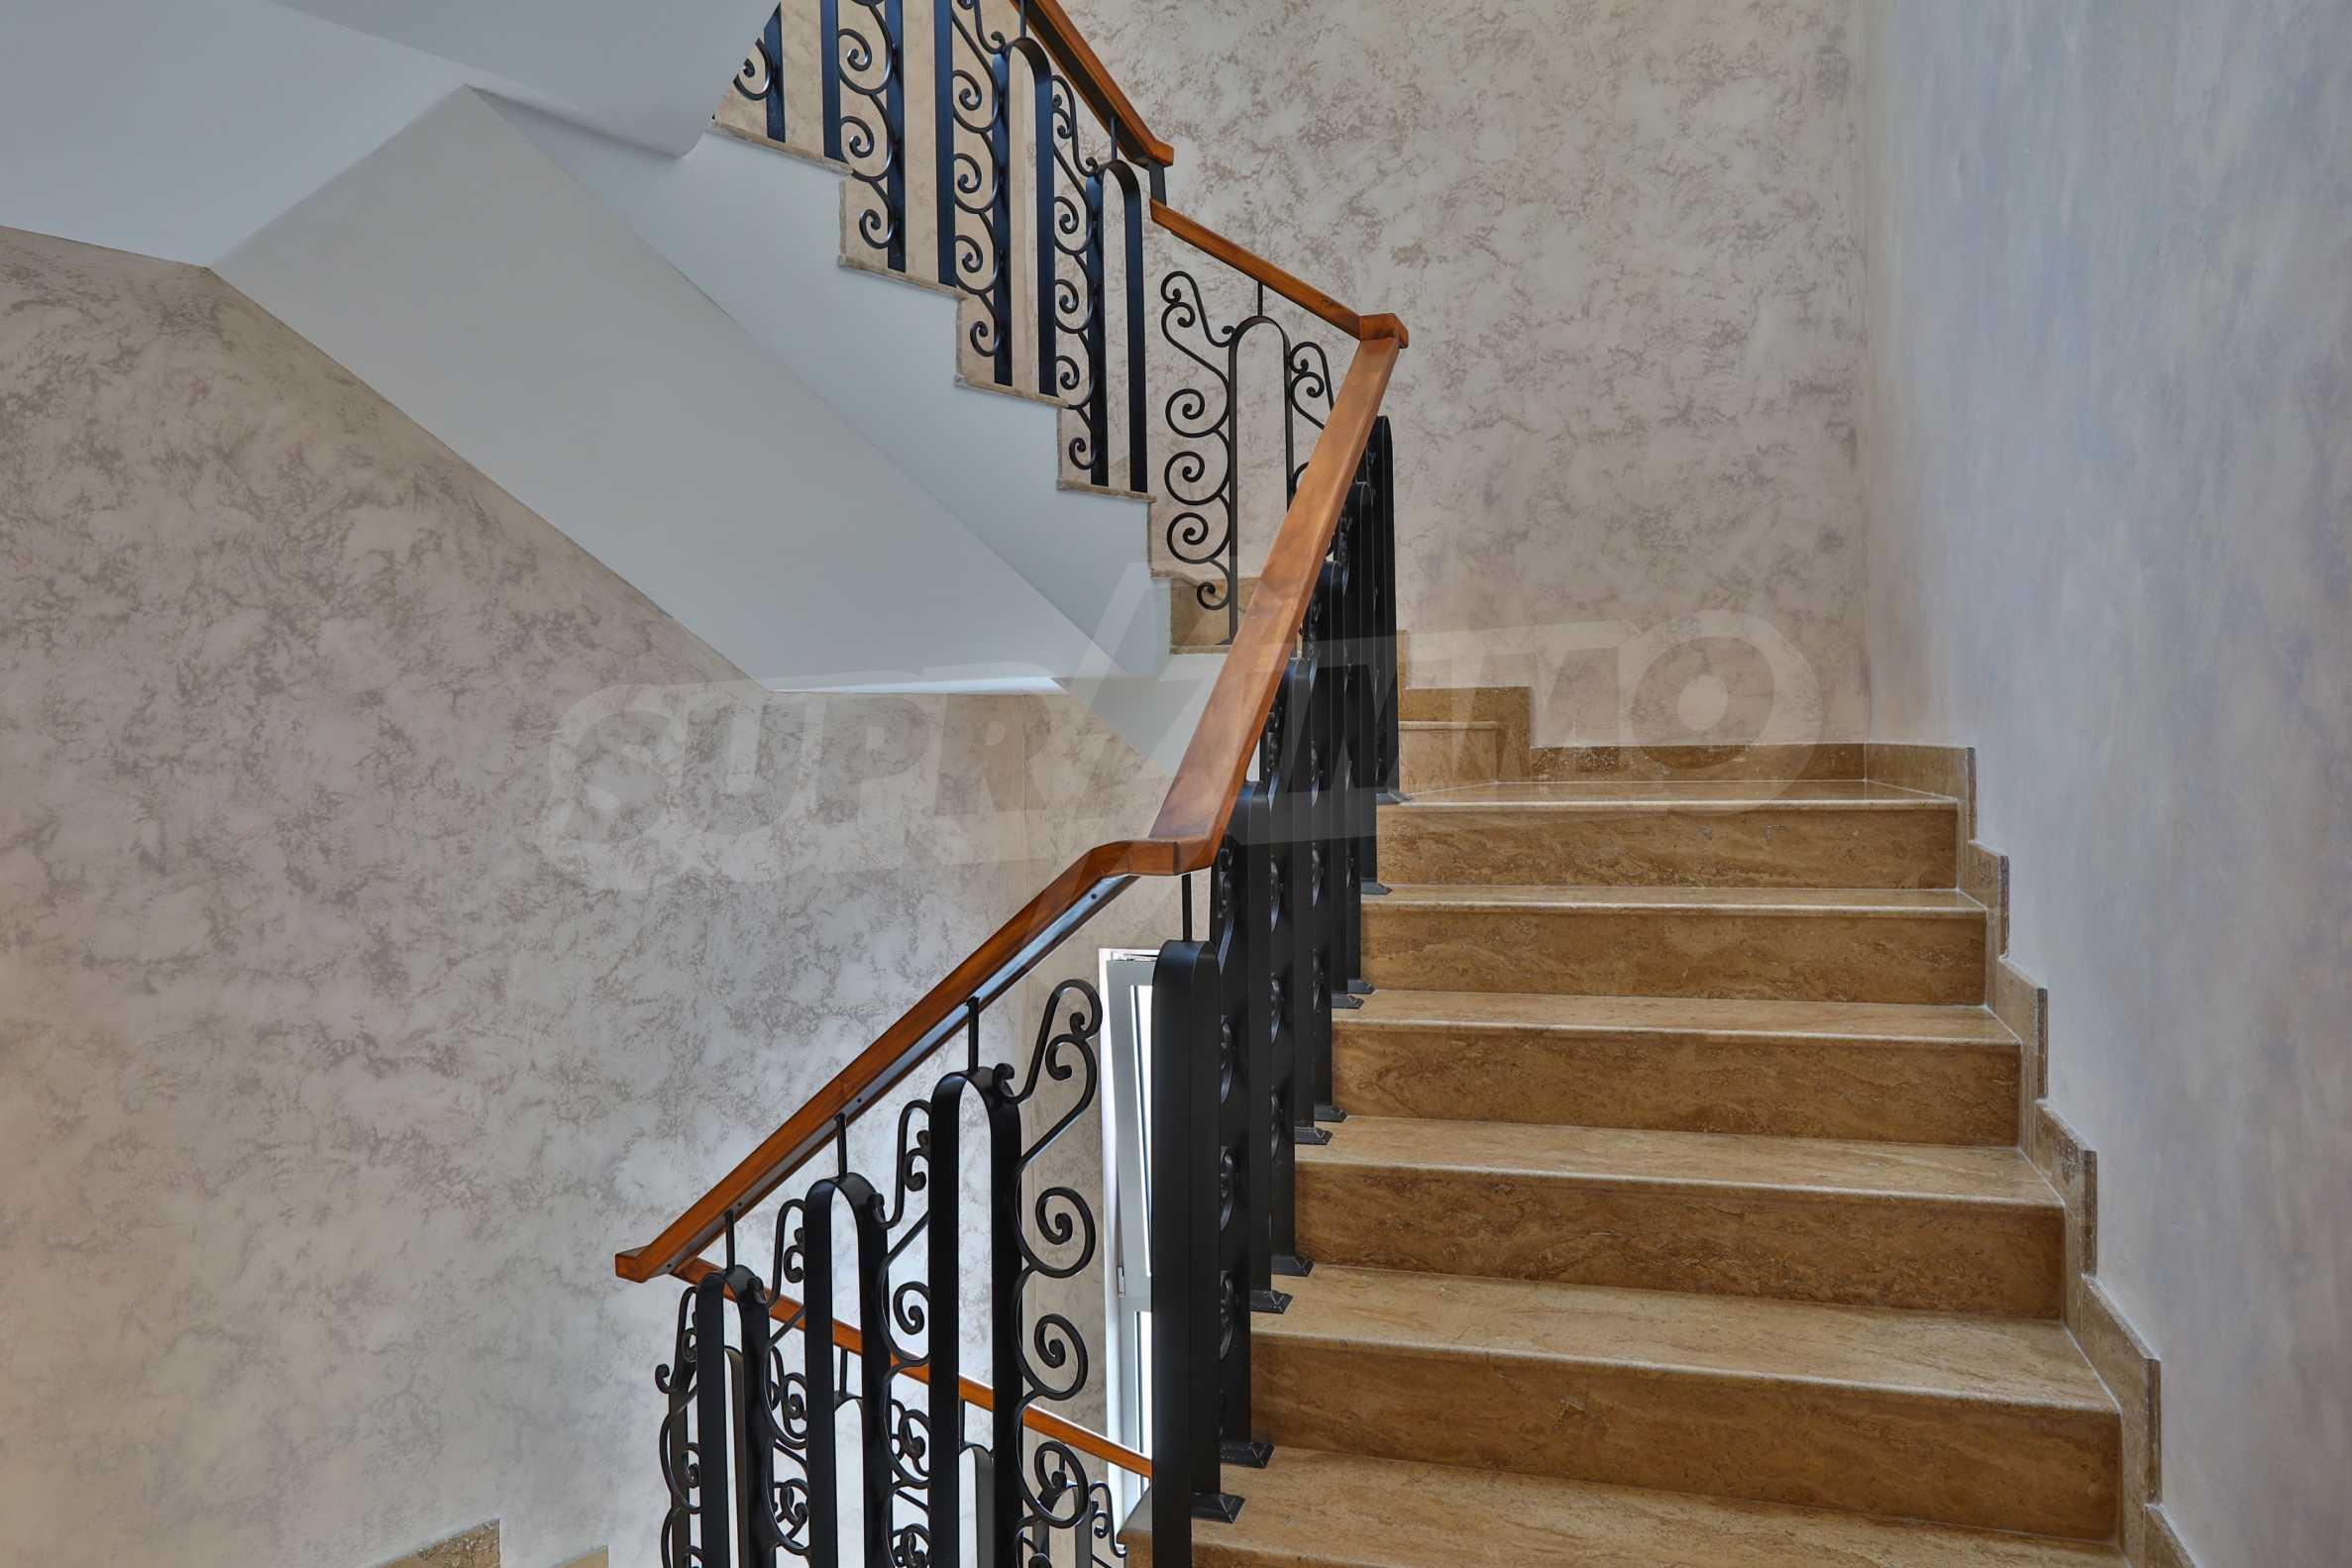 Дизайнерски тристаен апартамент под наем за летен сезон в резиденция Belle Époque в Лозенец 29